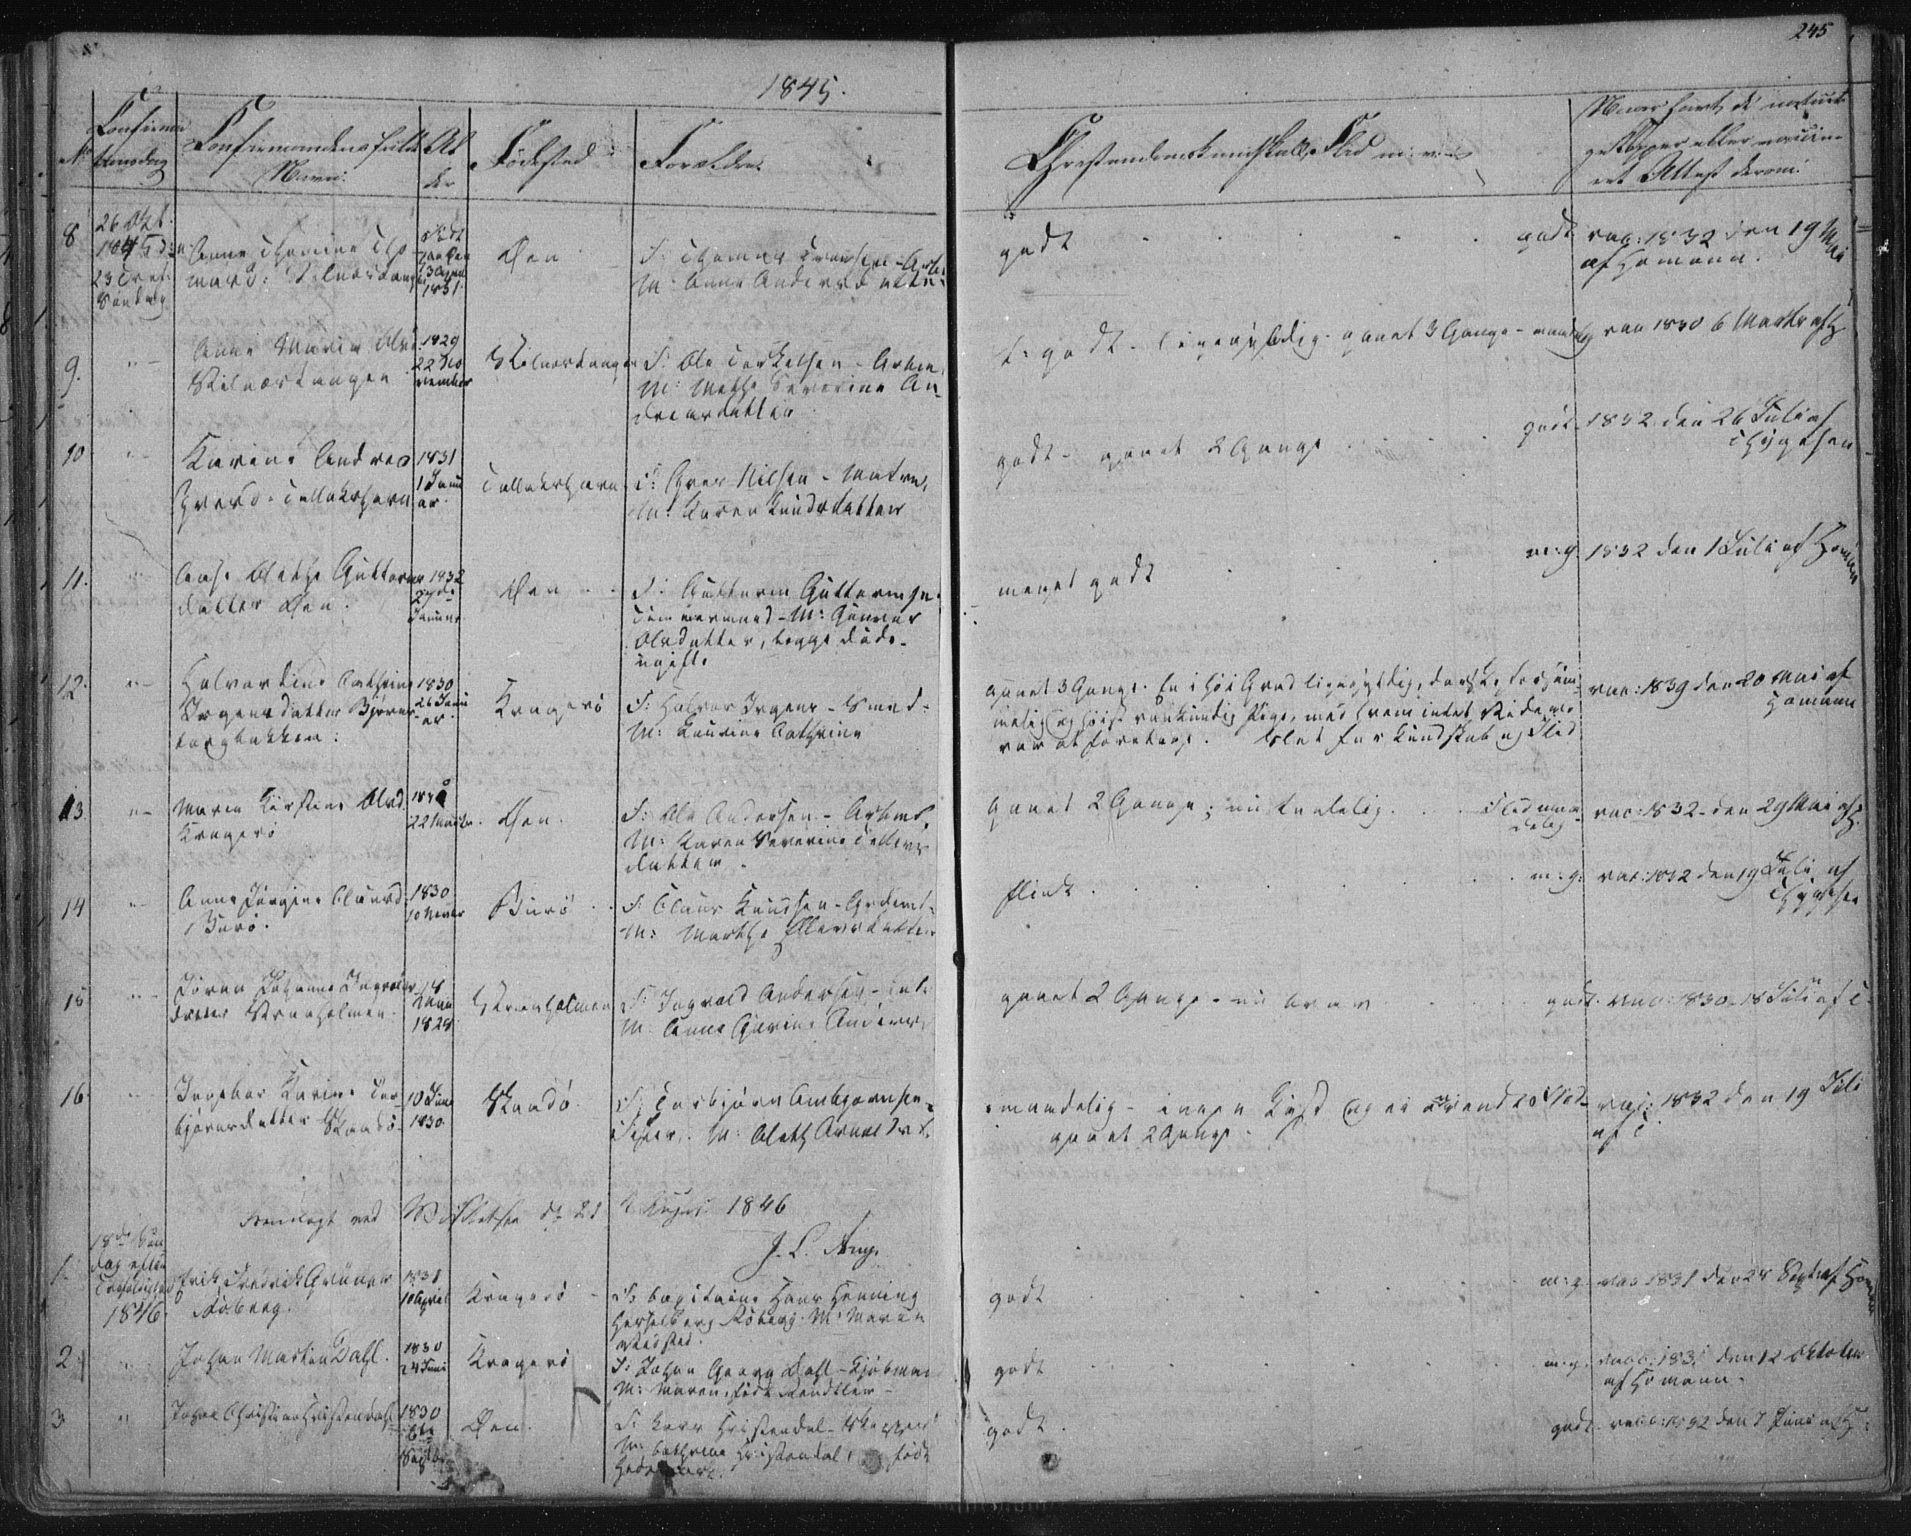 SAKO, Kragerø kirkebøker, F/Fa/L0005: Ministerialbok nr. 5, 1832-1847, s. 245